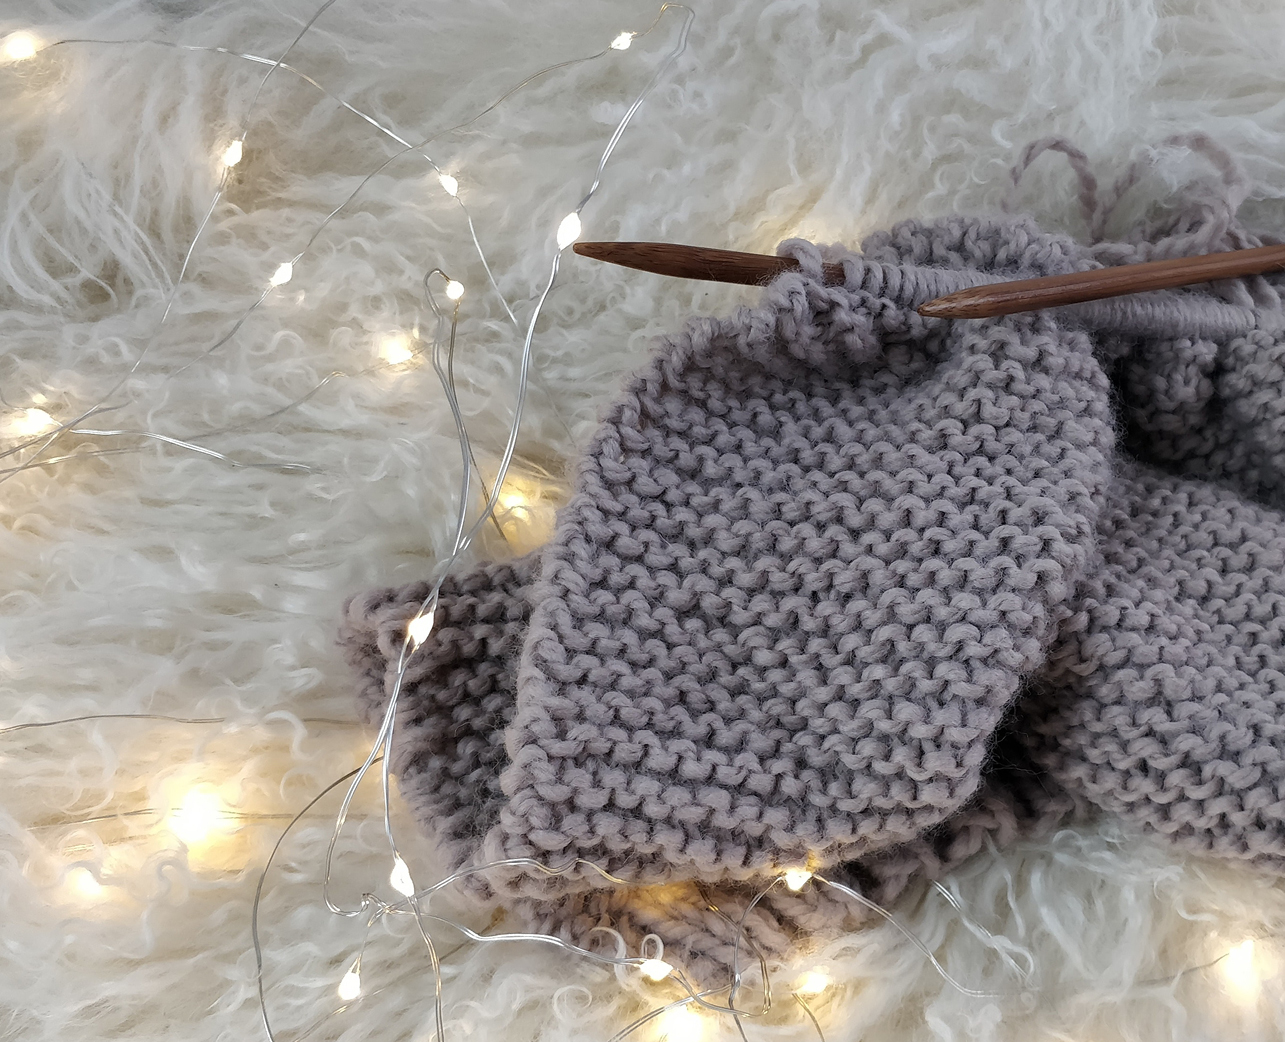 Knitting and Crochet Society (KnitSoc)